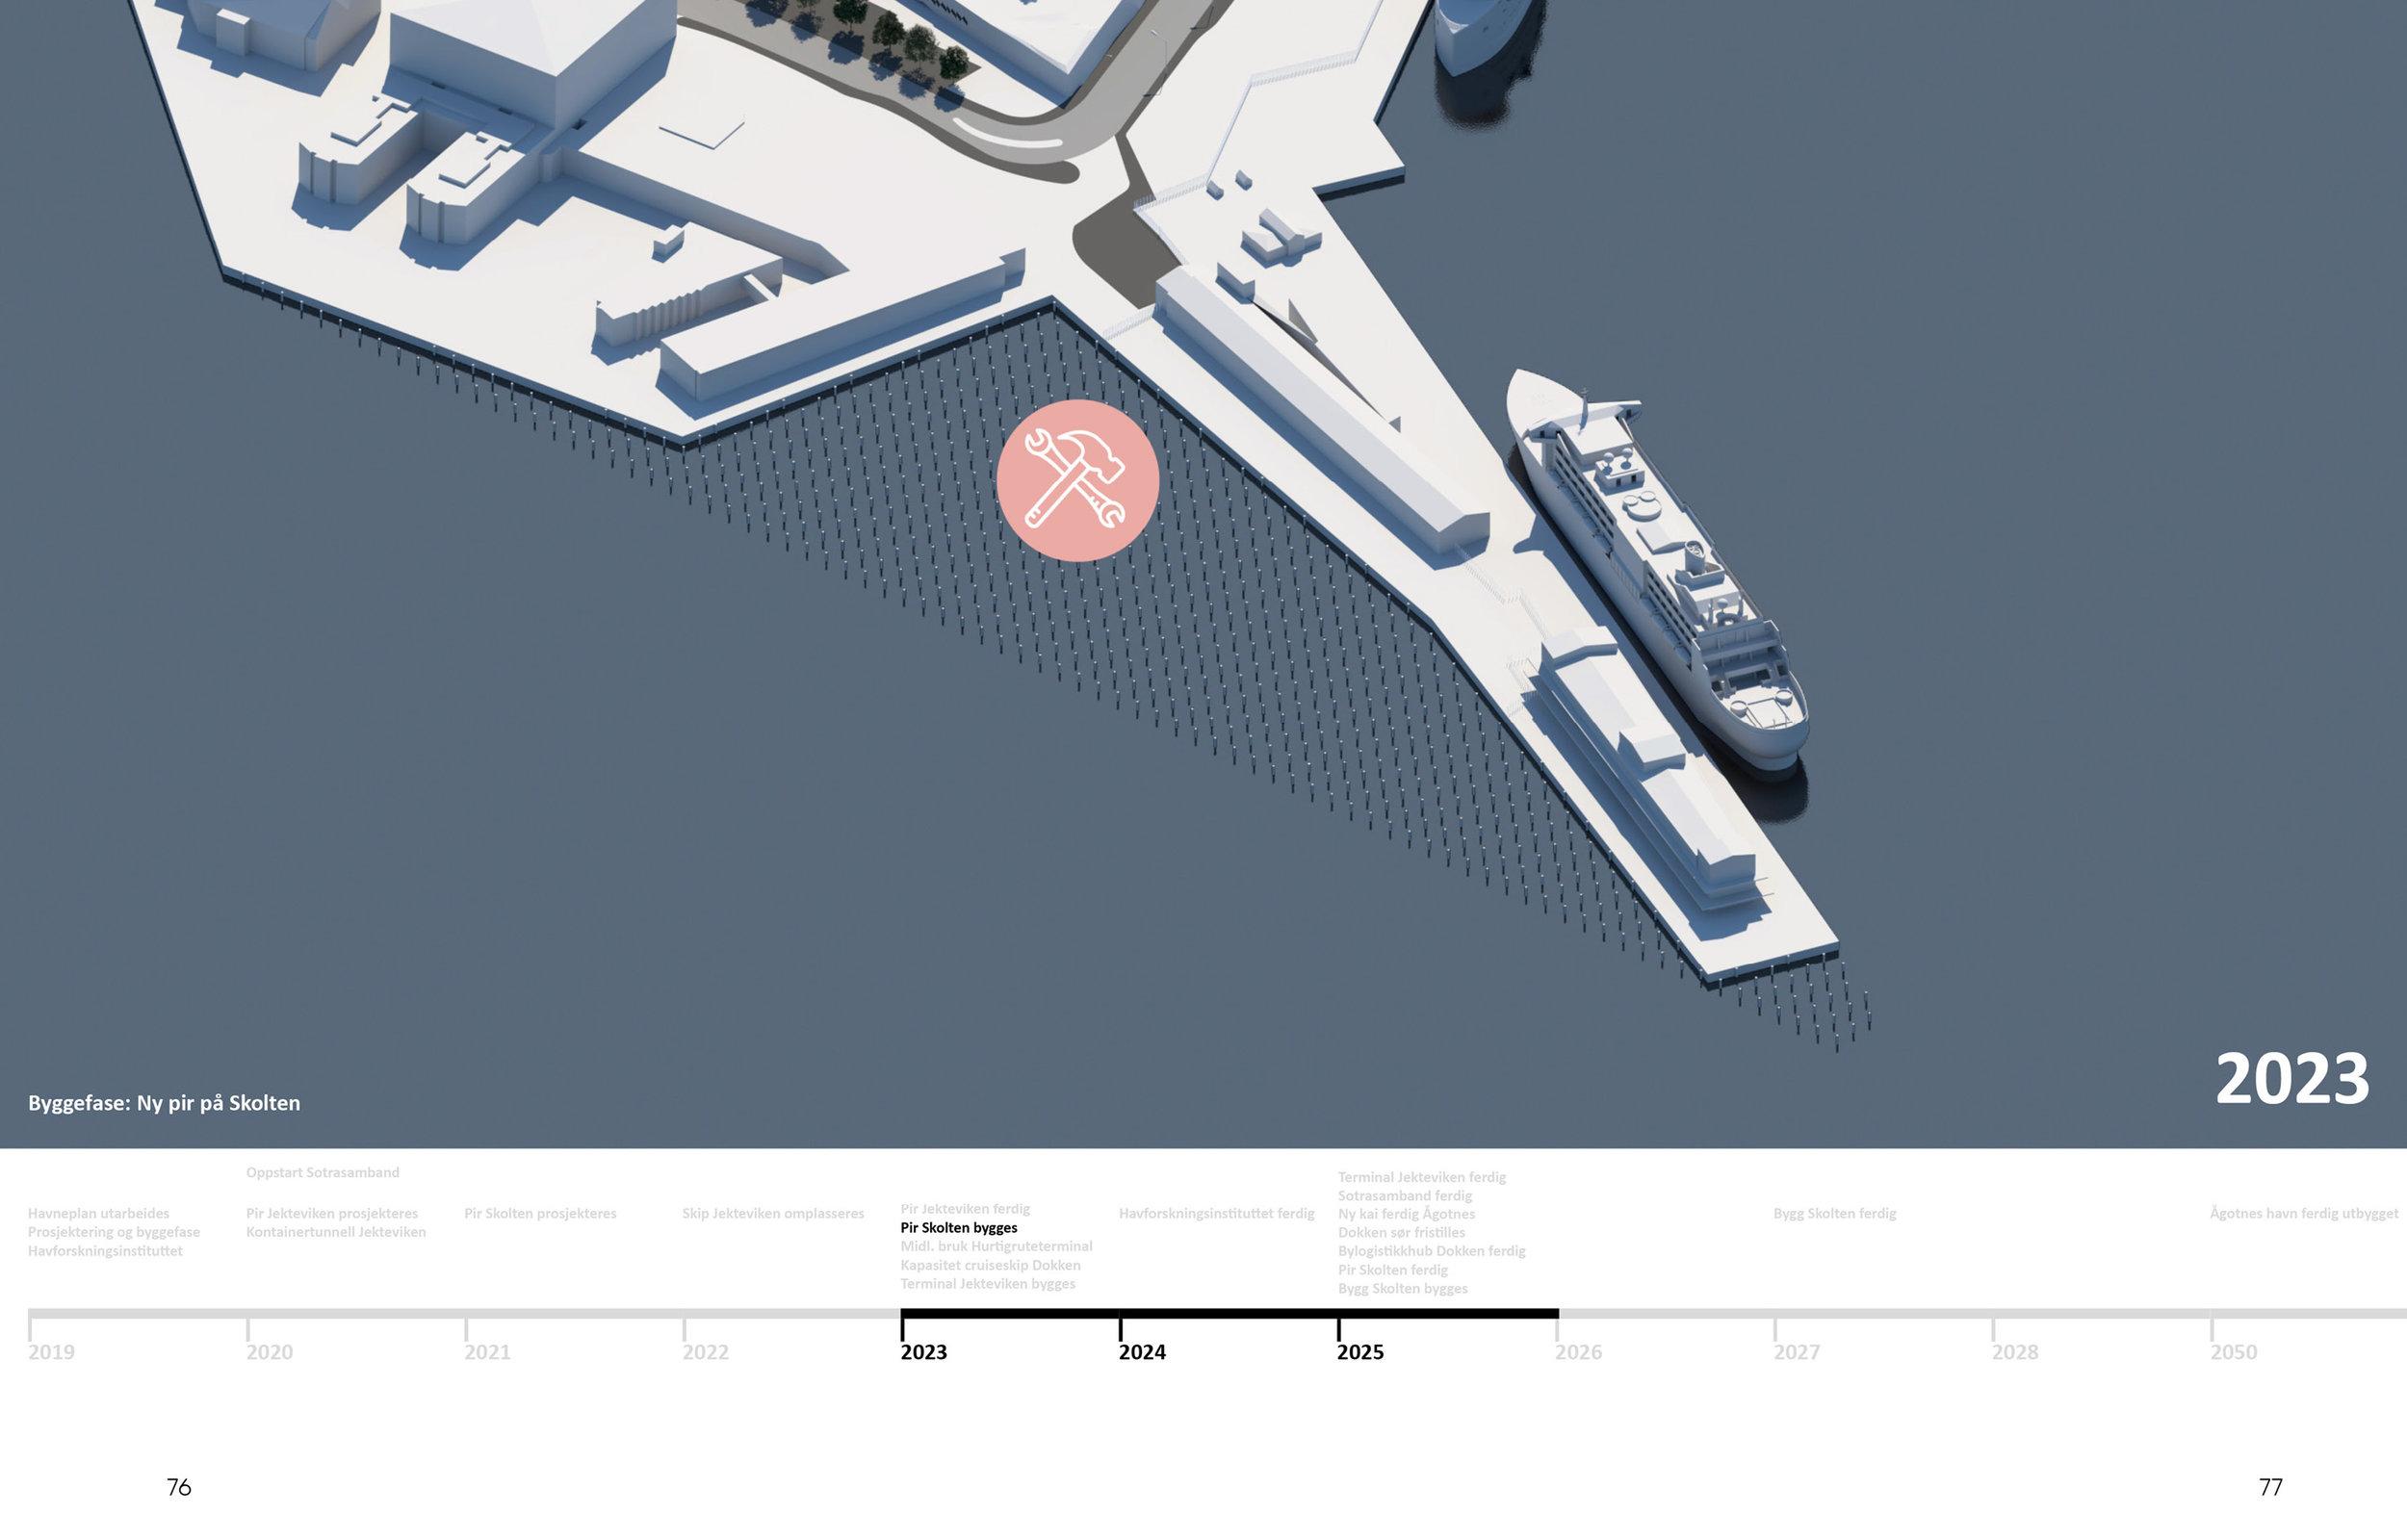 Havneplan9.jpg